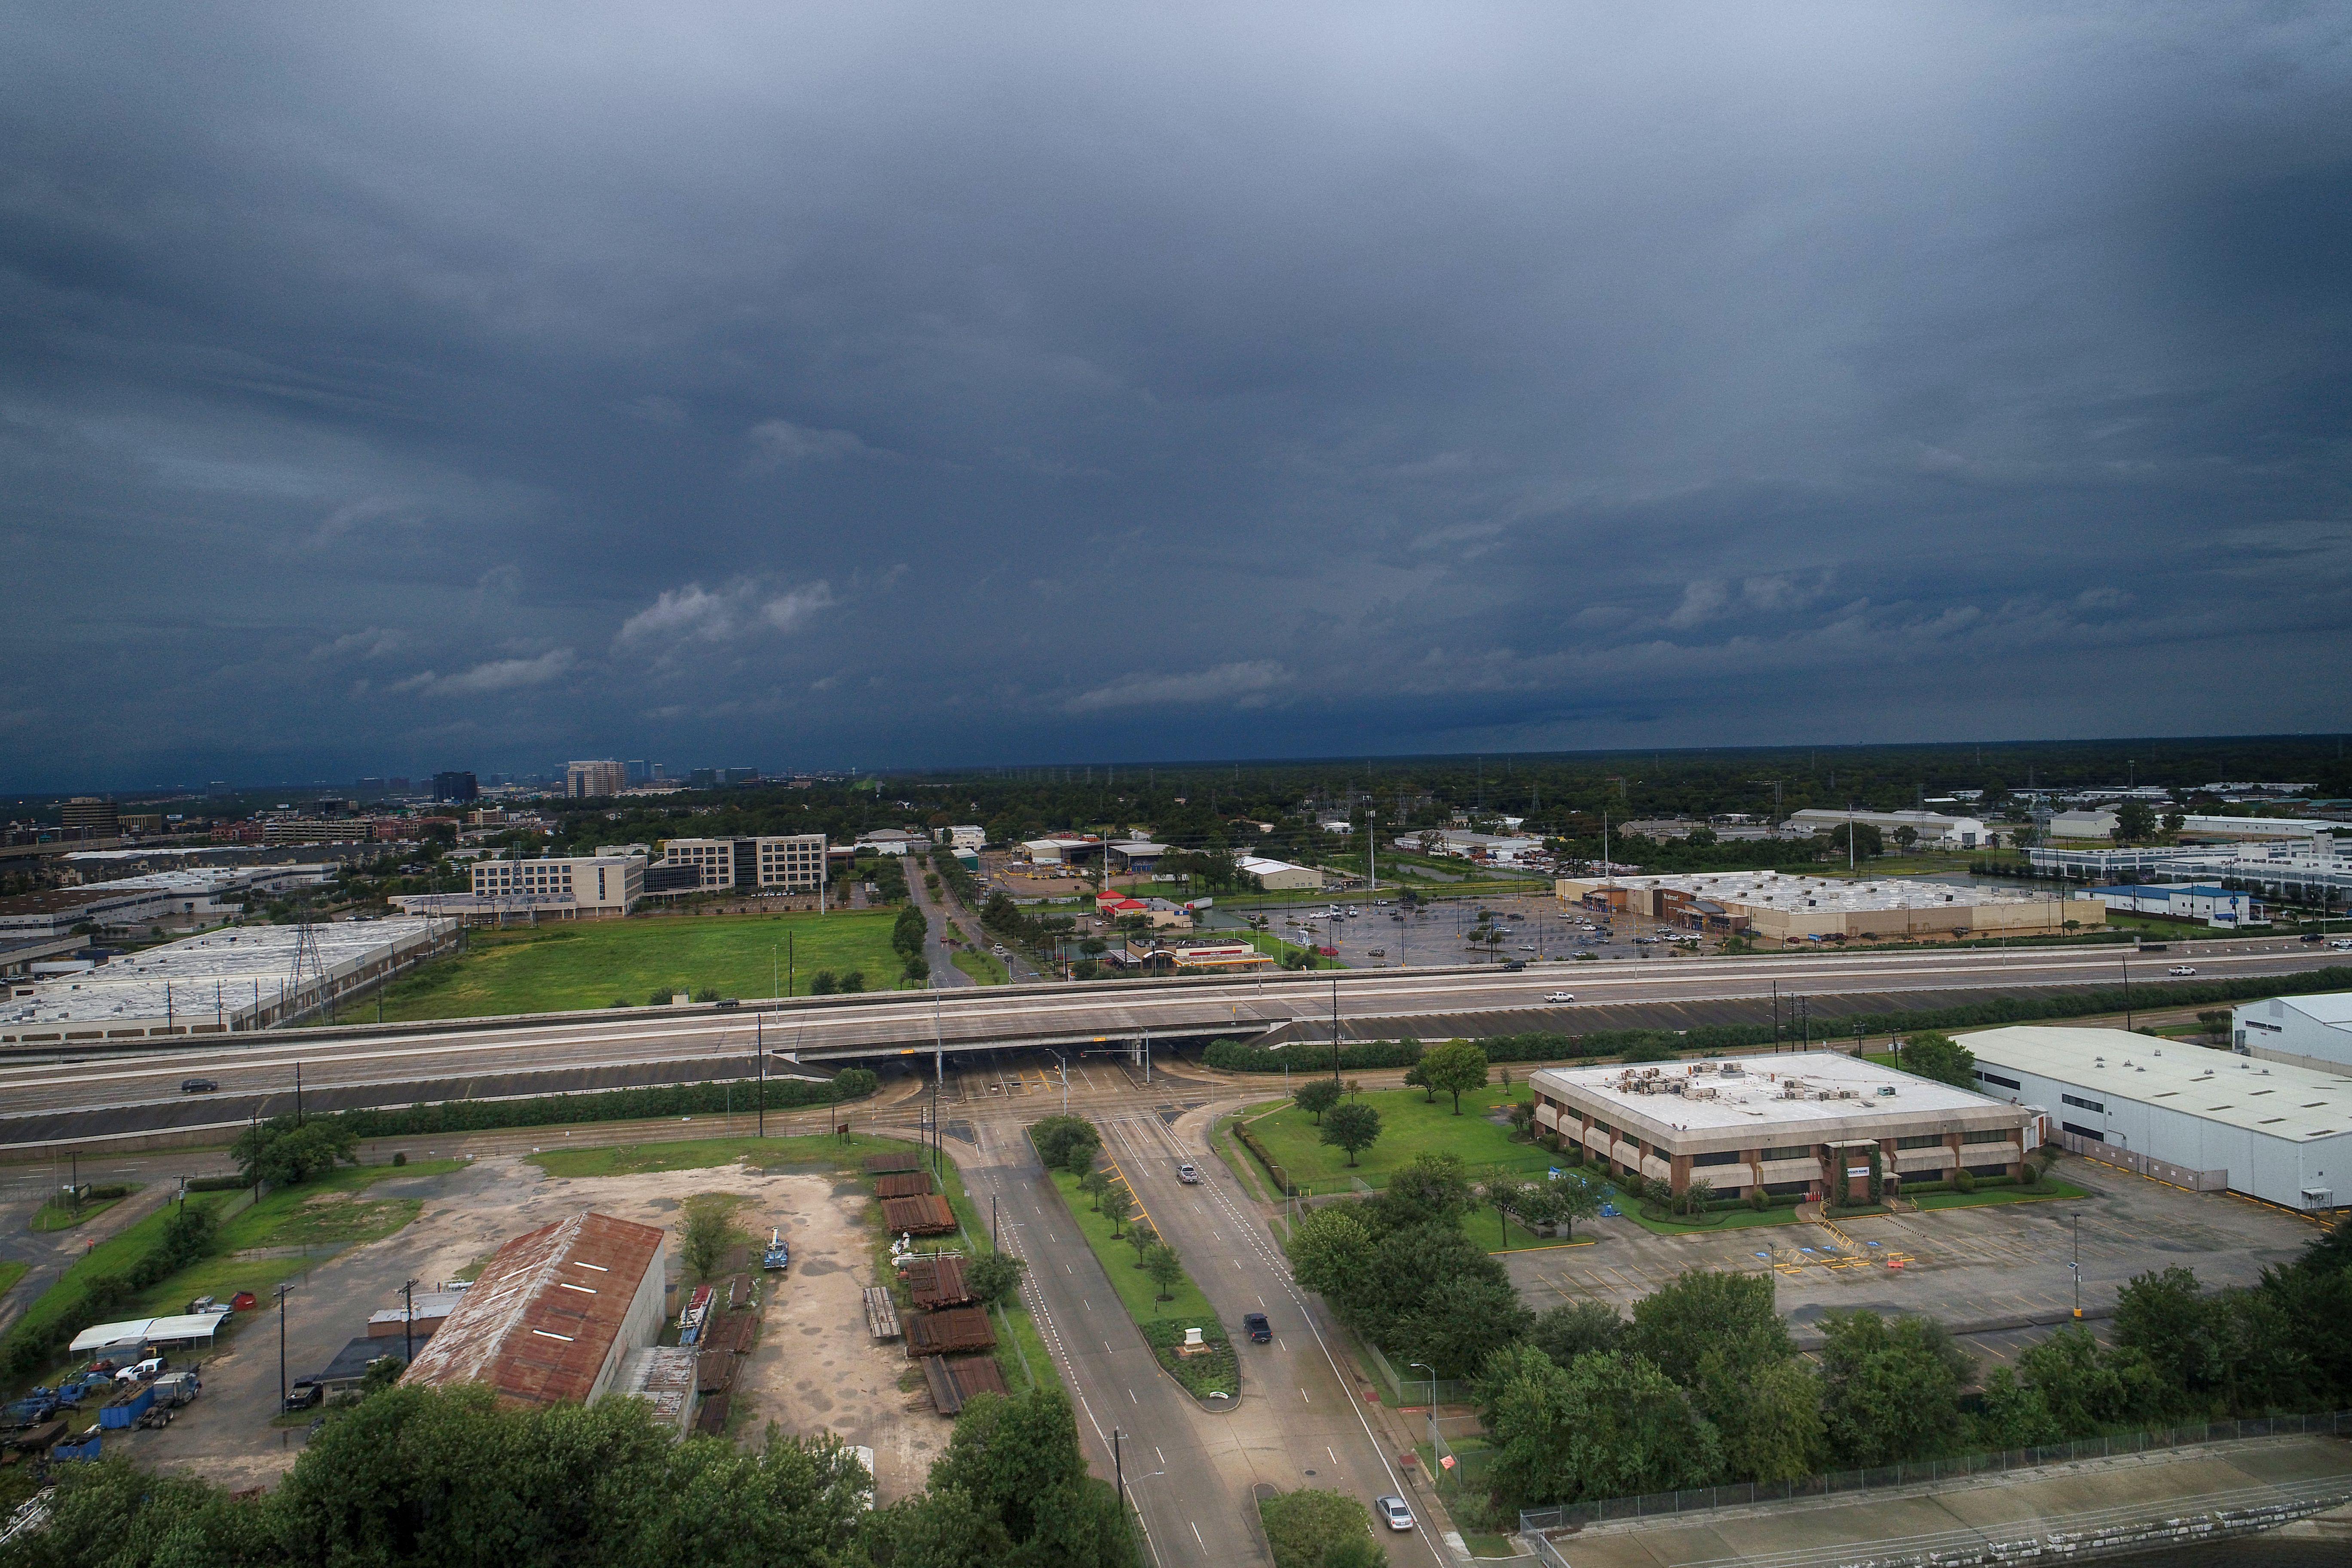 HurricaneHarvey_Day2_08